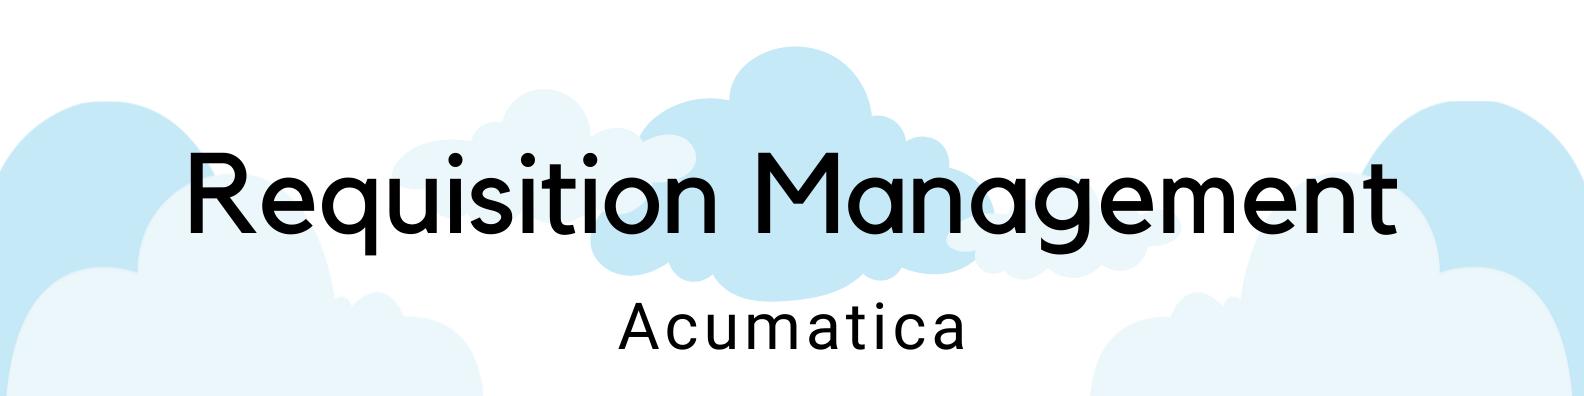 ICAN Acumatica Requisition Management header